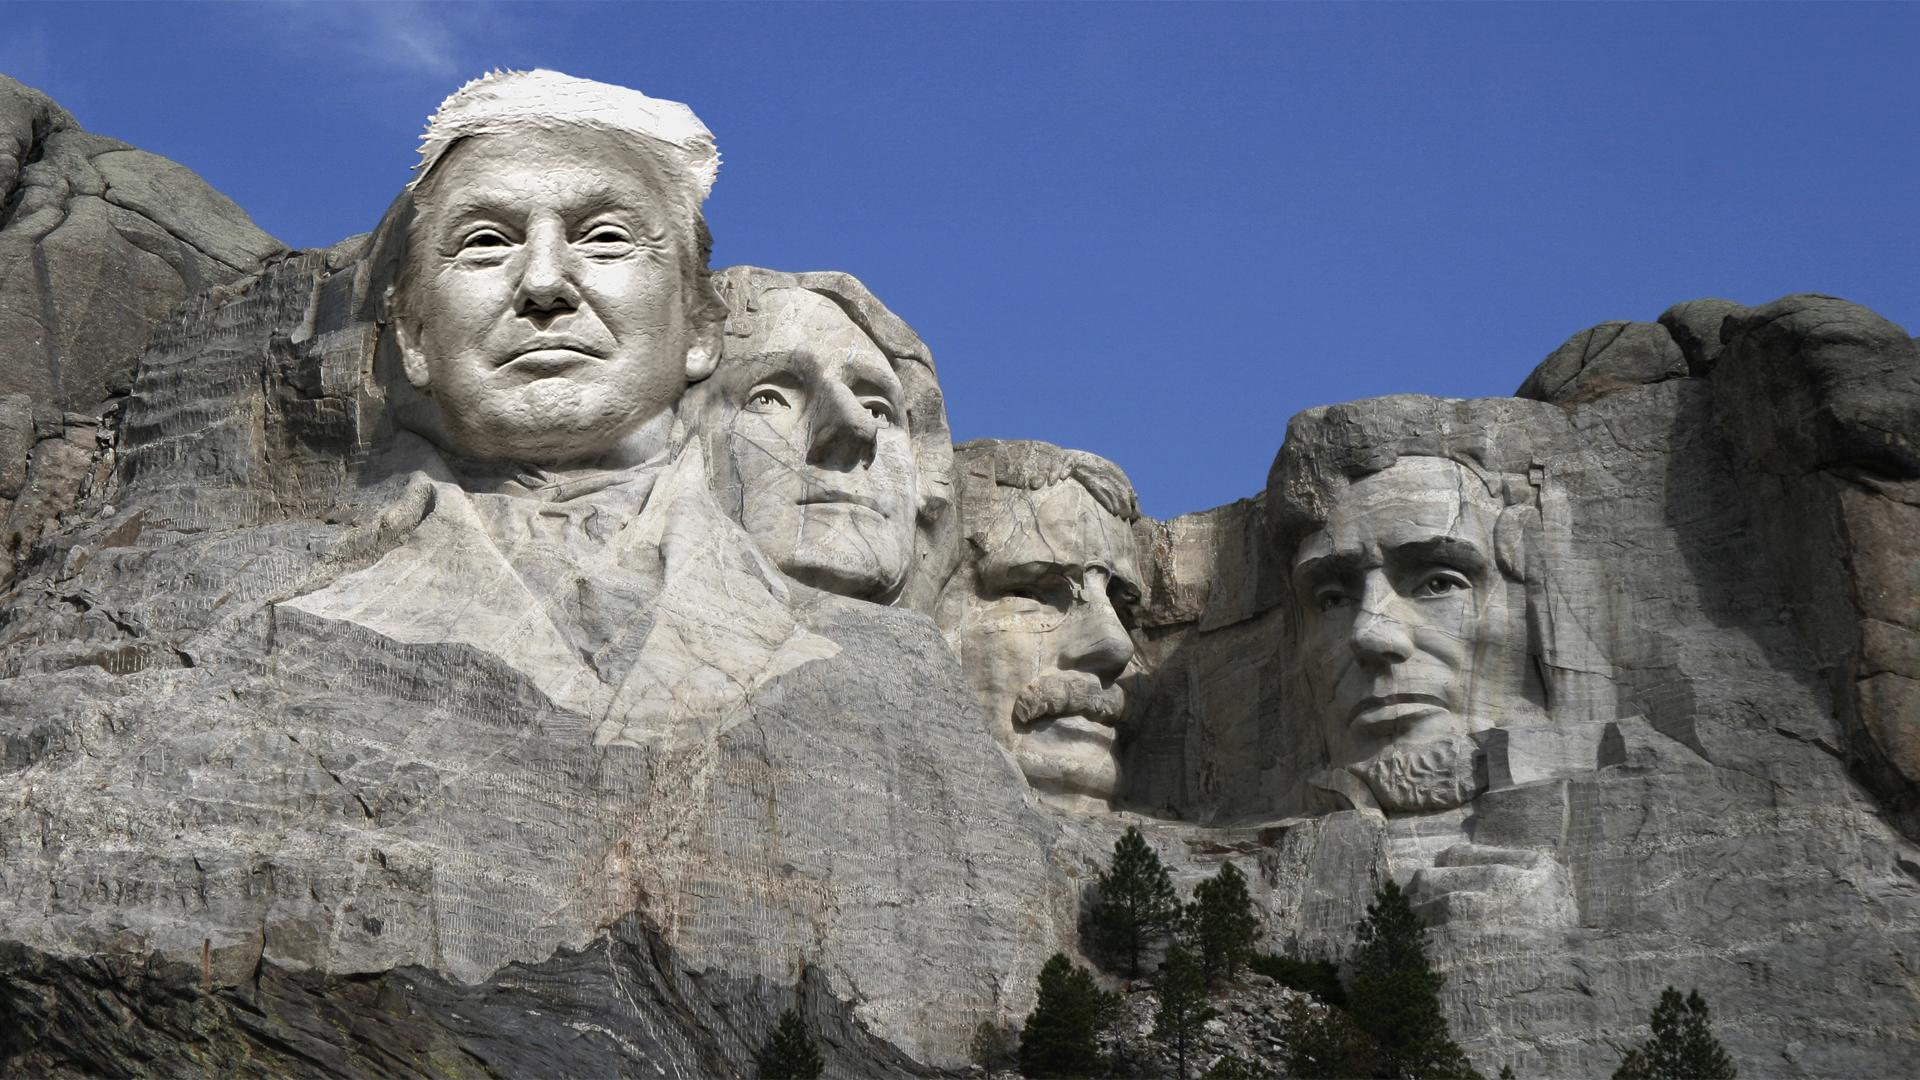 Trump Rushmore